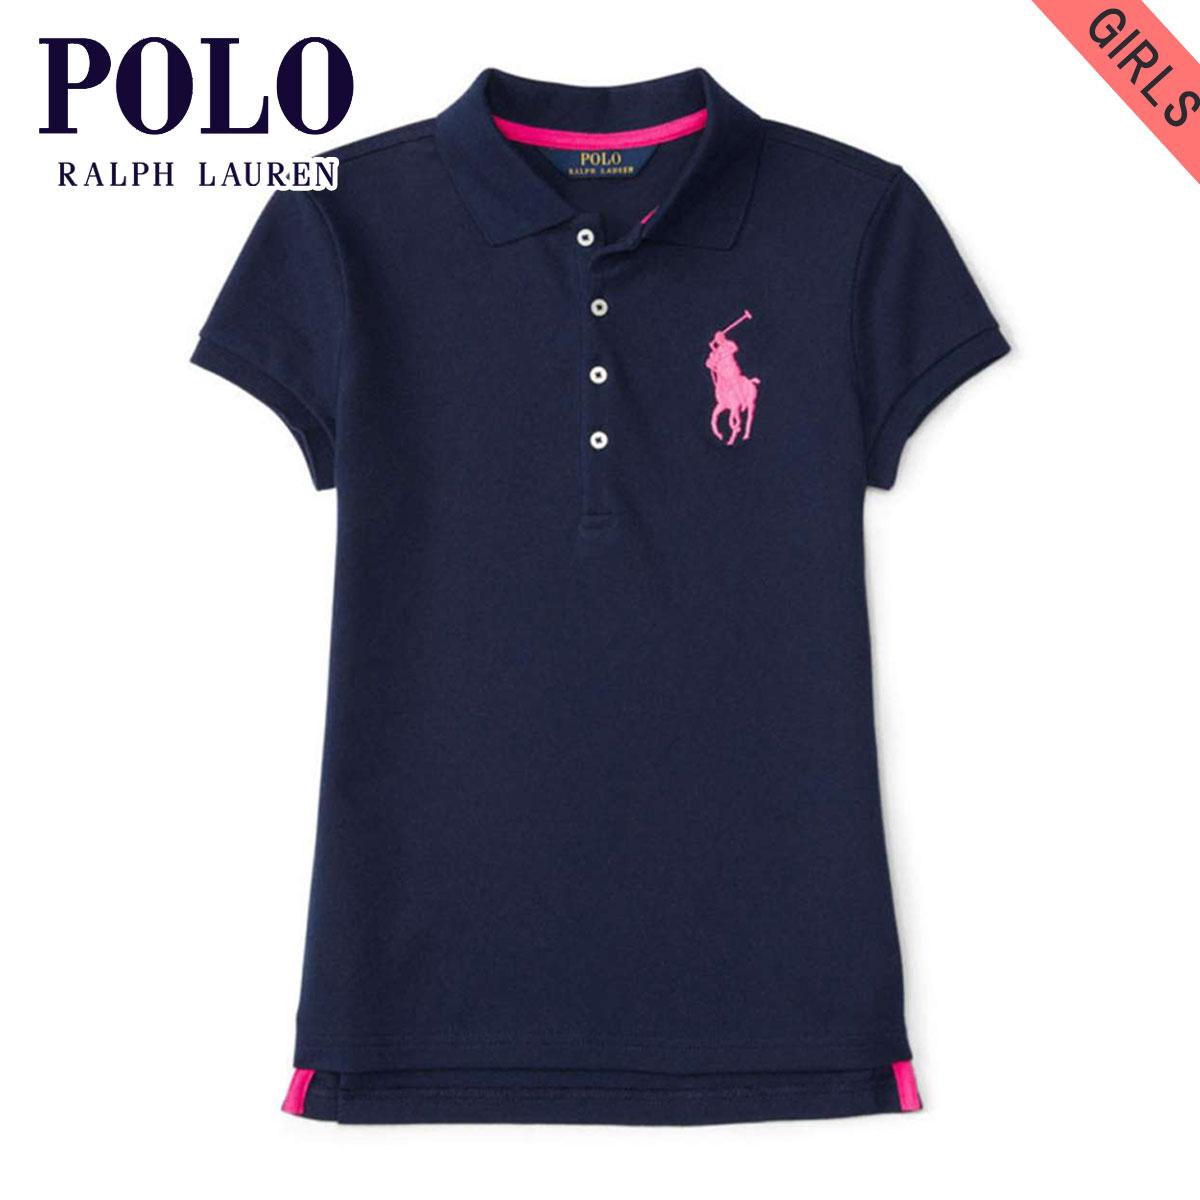 d9c29b40331d Poloralflorenkids POLO RALPH LAUREN CHILDREN genuine kids clothing girls  short sleeve polo shirt BIG PONY STRETCH COTTON POLO 99493546 20P05Nov16